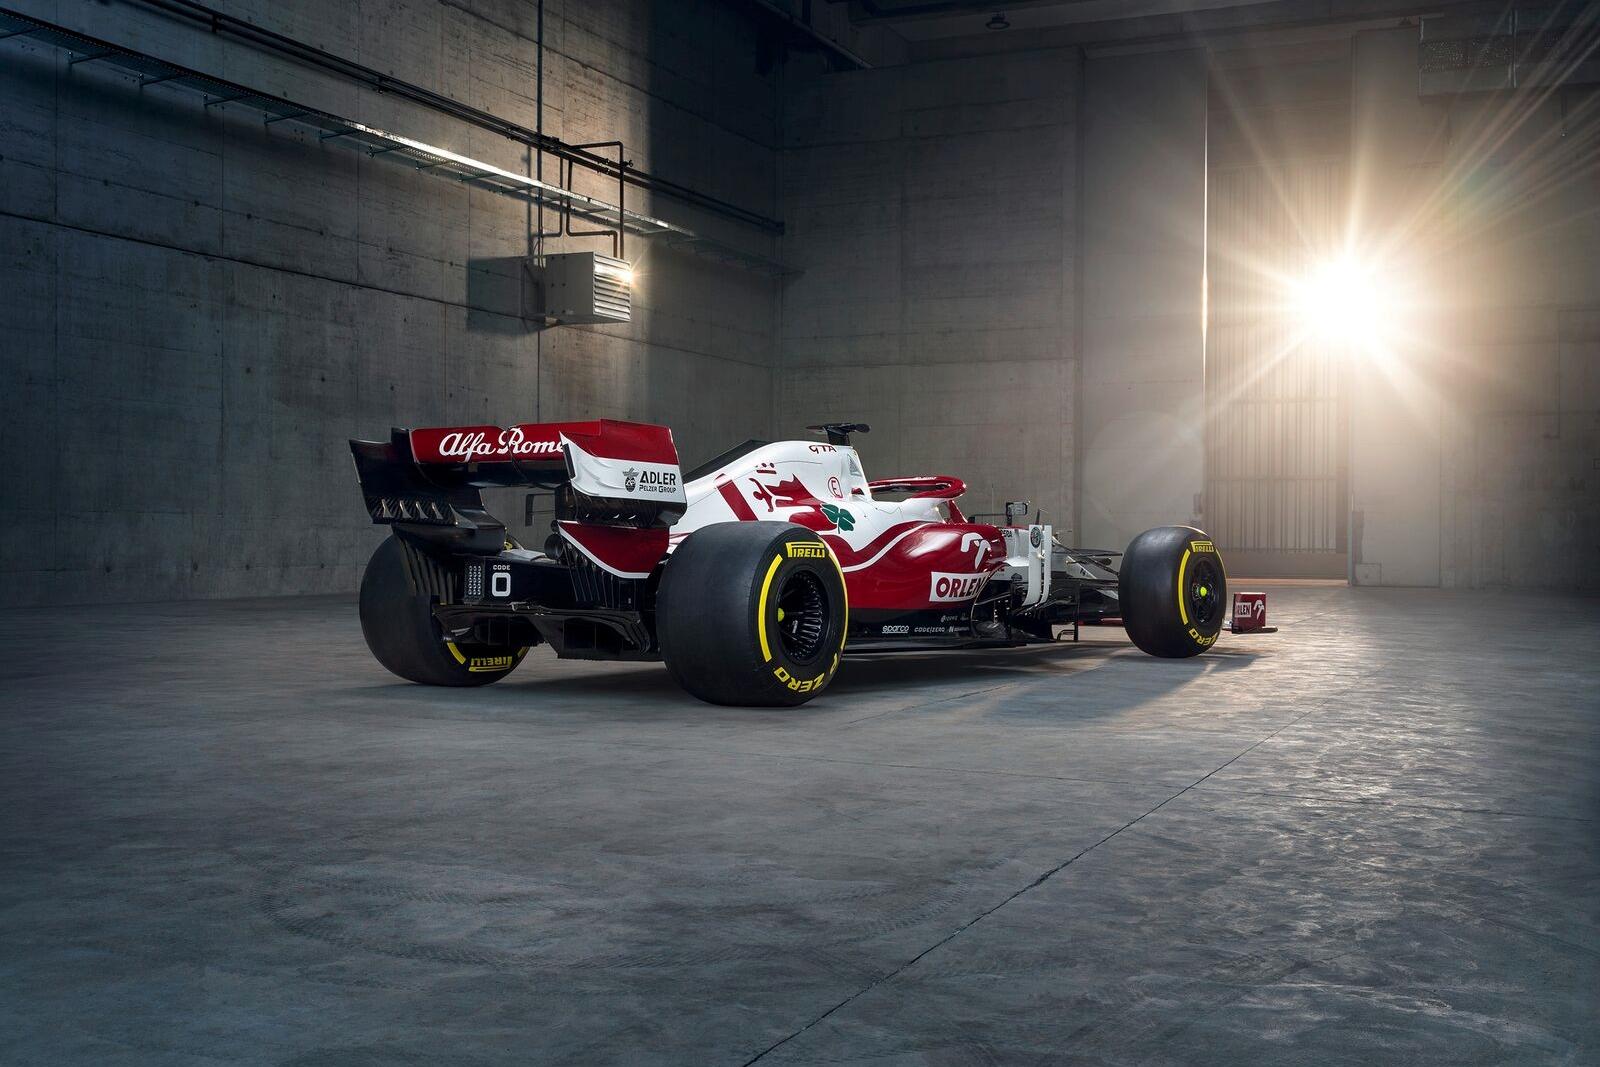 Bemutatkozott az Alfa Romeo 2021-es autója, a C41-es.<br />Fotó: Alfa Romeo Racing Media